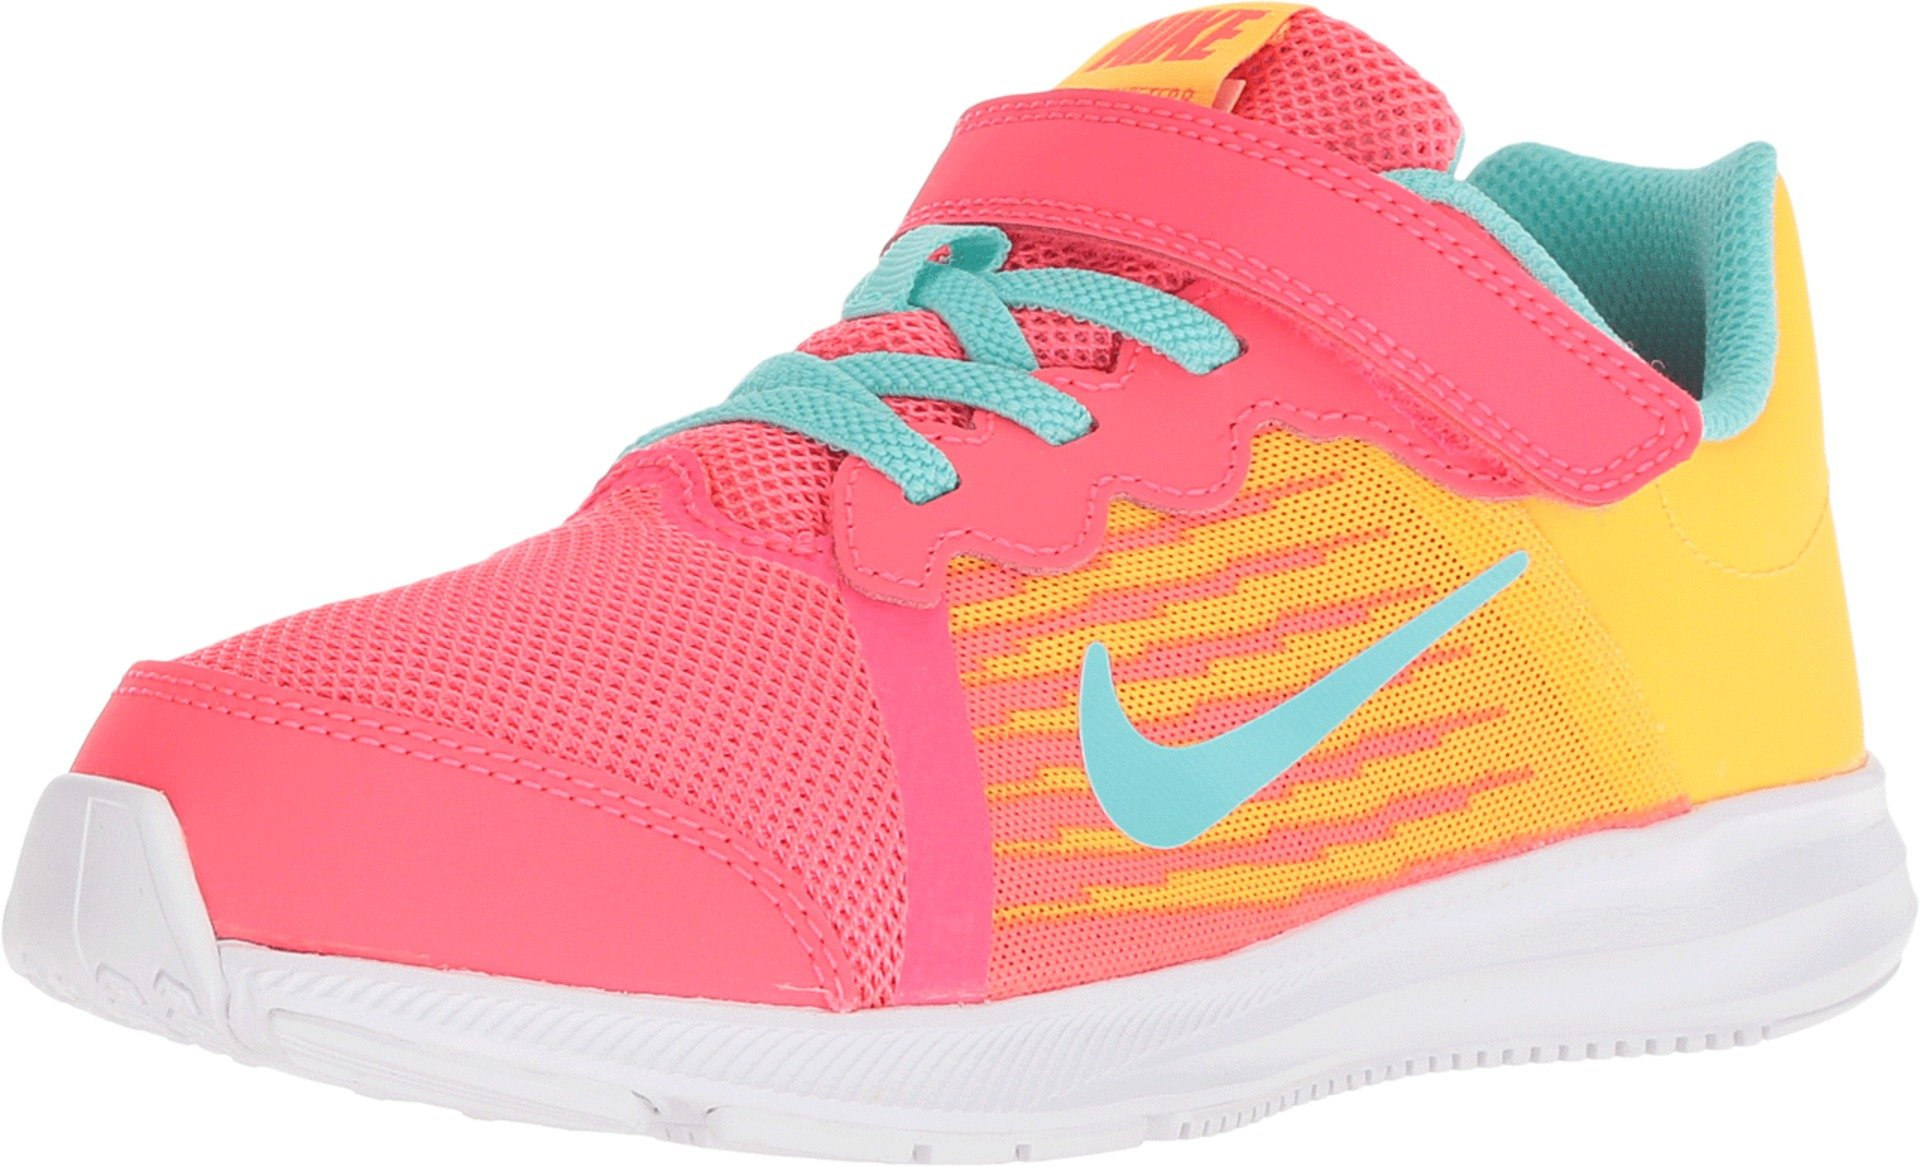 Nike Kids' Preschool Downshifter 8 Fade Running Shoes (1.5, Red/Green) by Nike (Image #1)